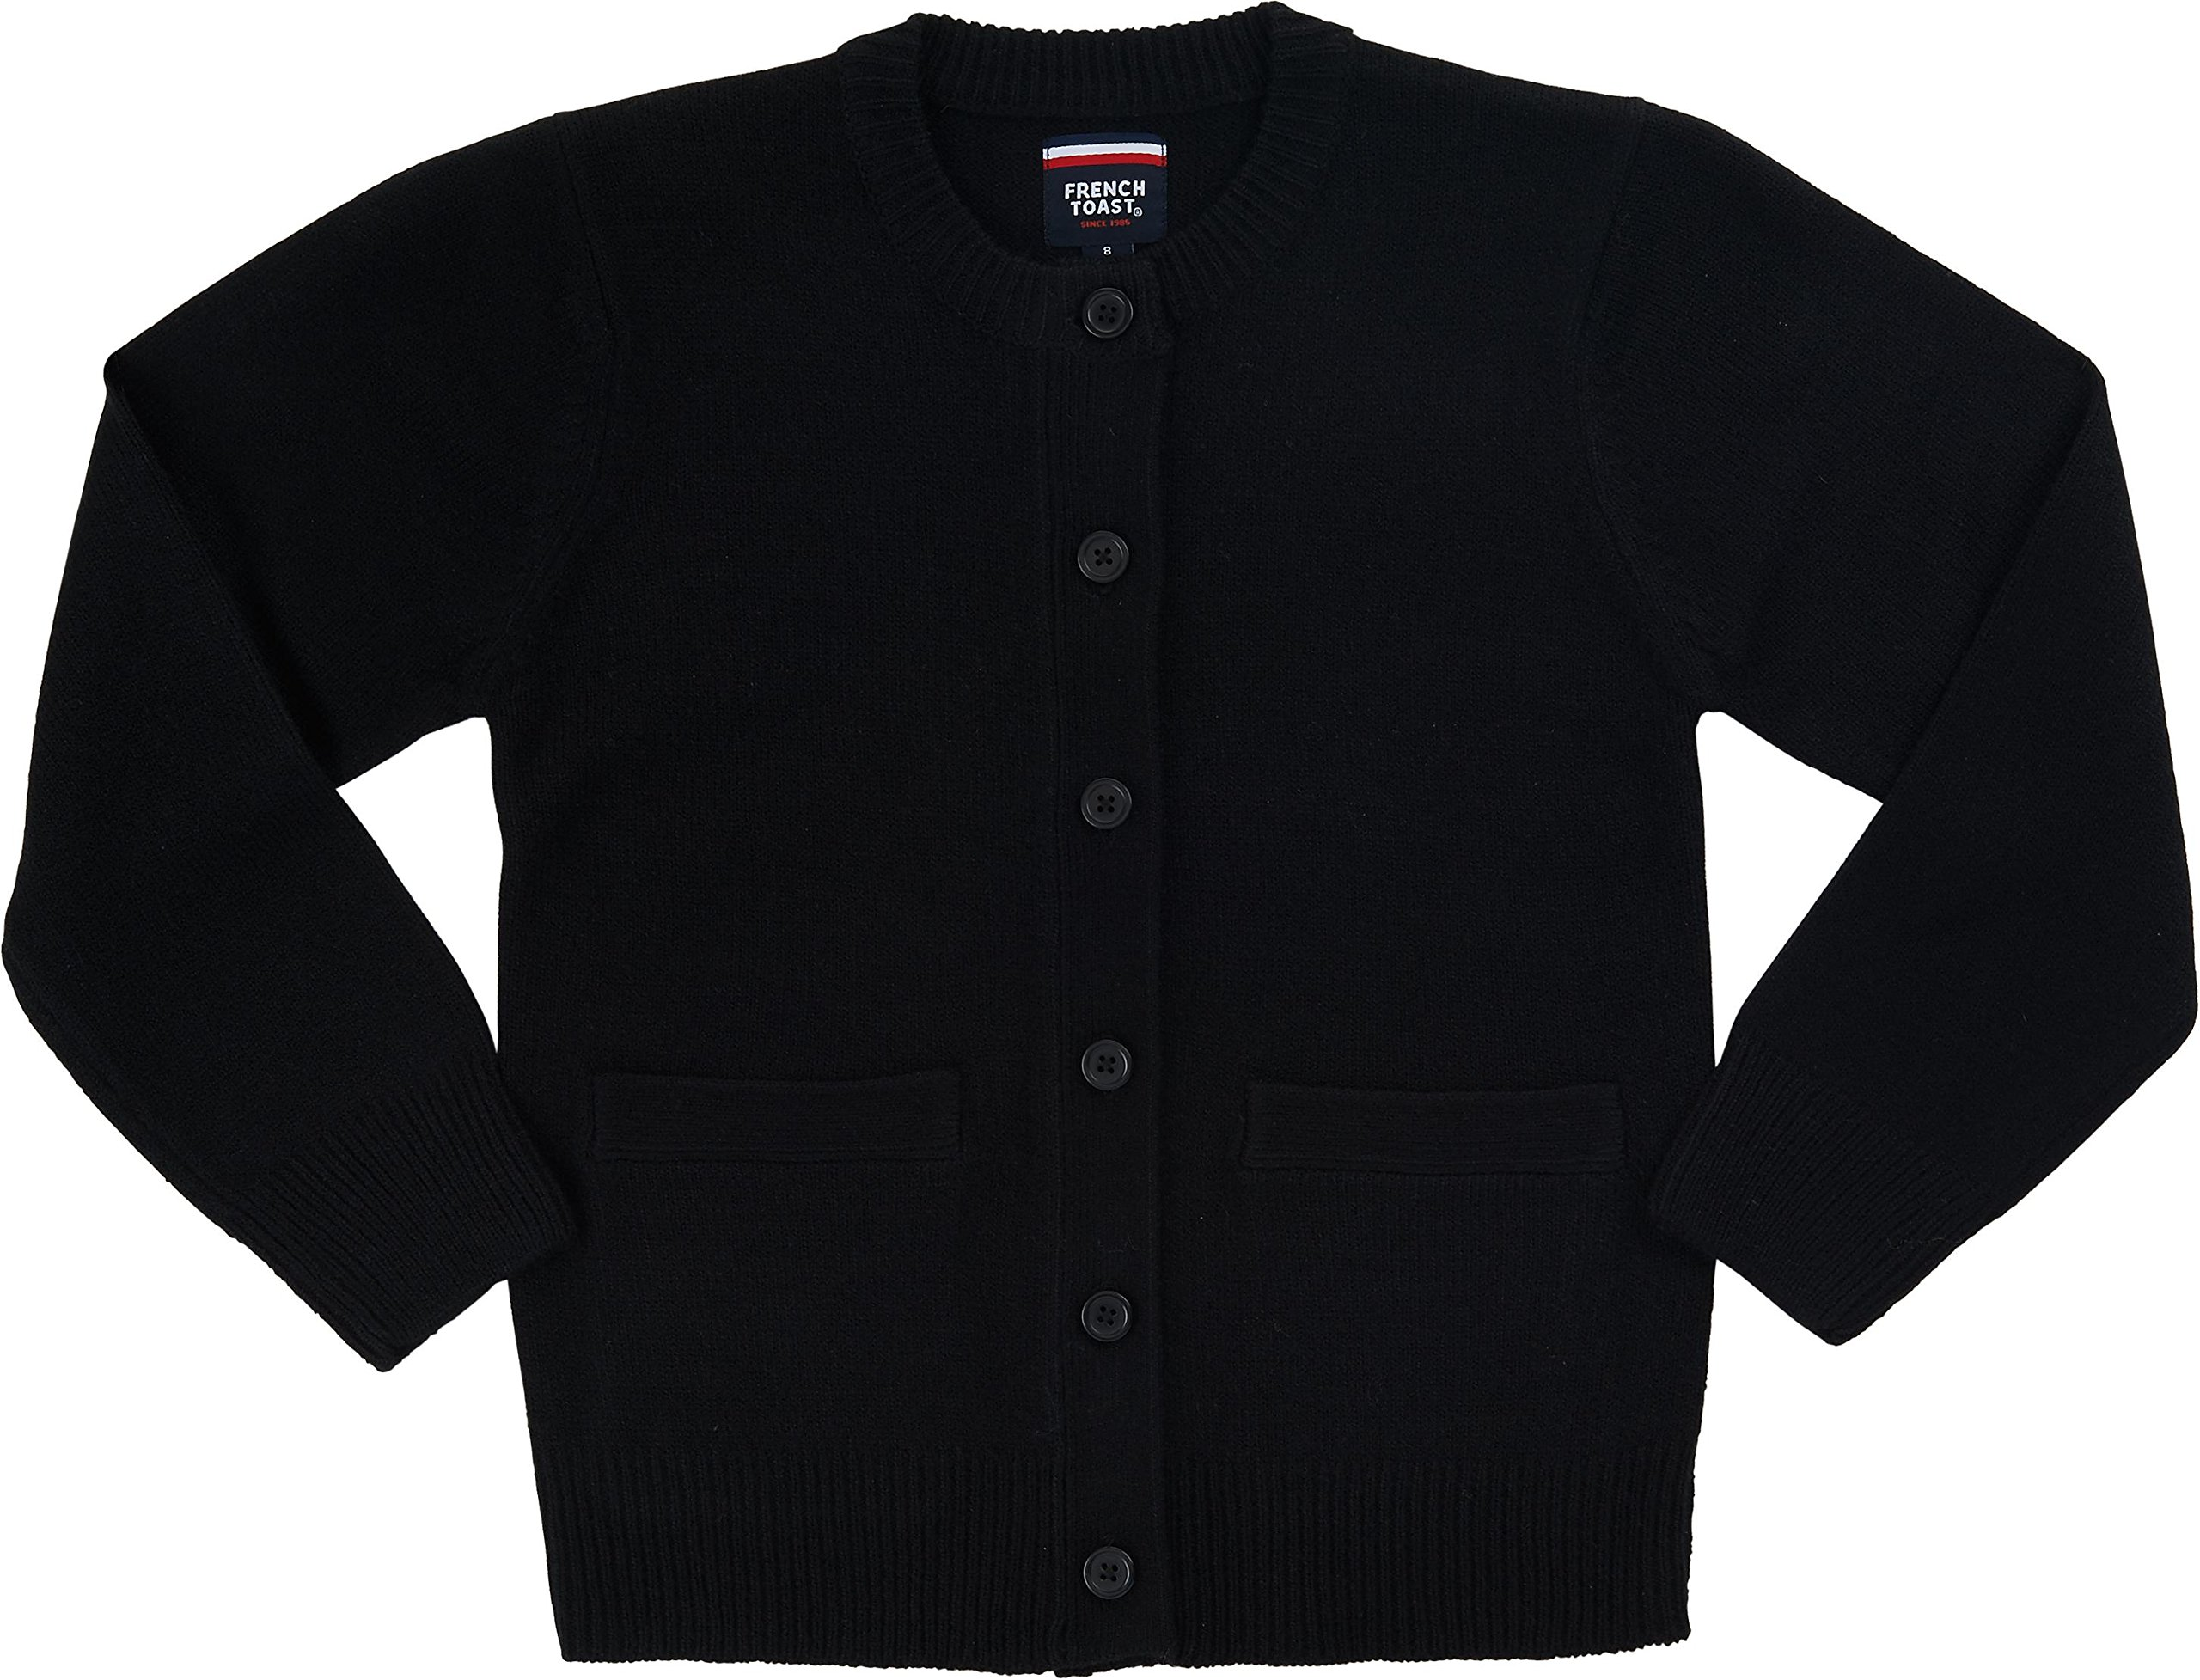 French Toast School Uniform Girls Anti-Pill Crew Neck Cardigan Sweater, Black, 2T